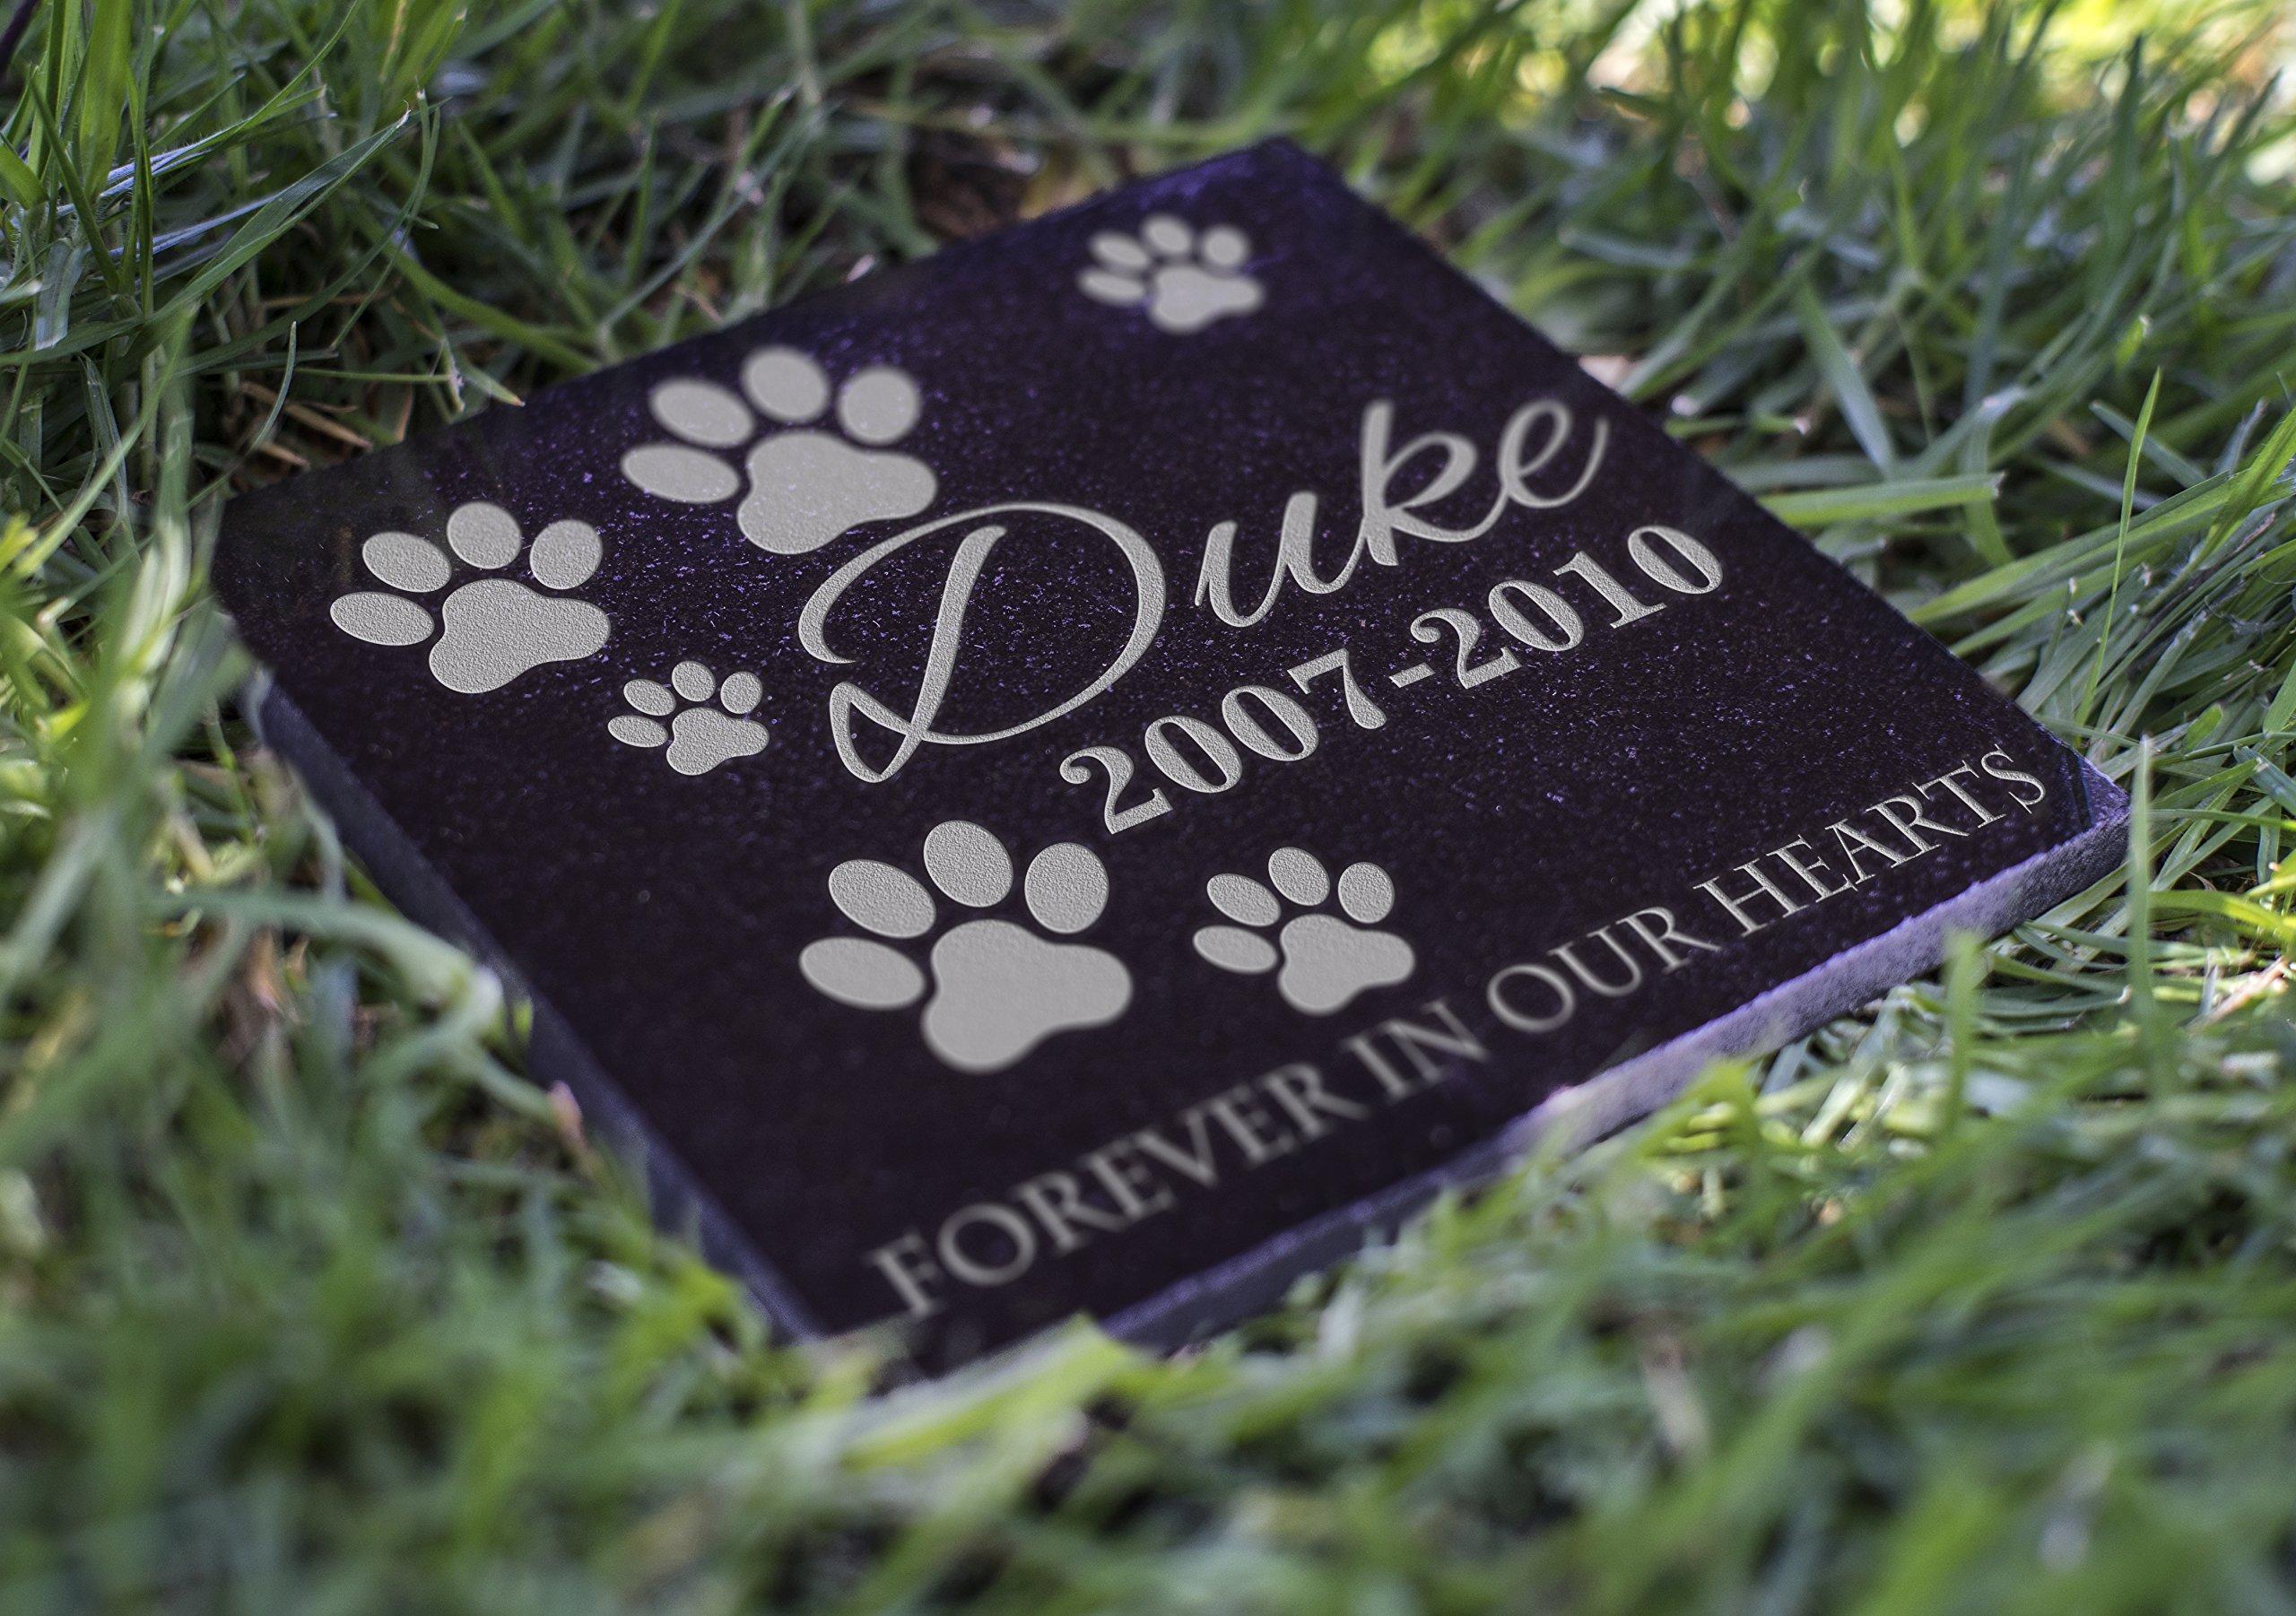 Memorial Pet Headstone - Loyal Companion, Dog and Cat Personalized Custom Granite Grave Marker D-4